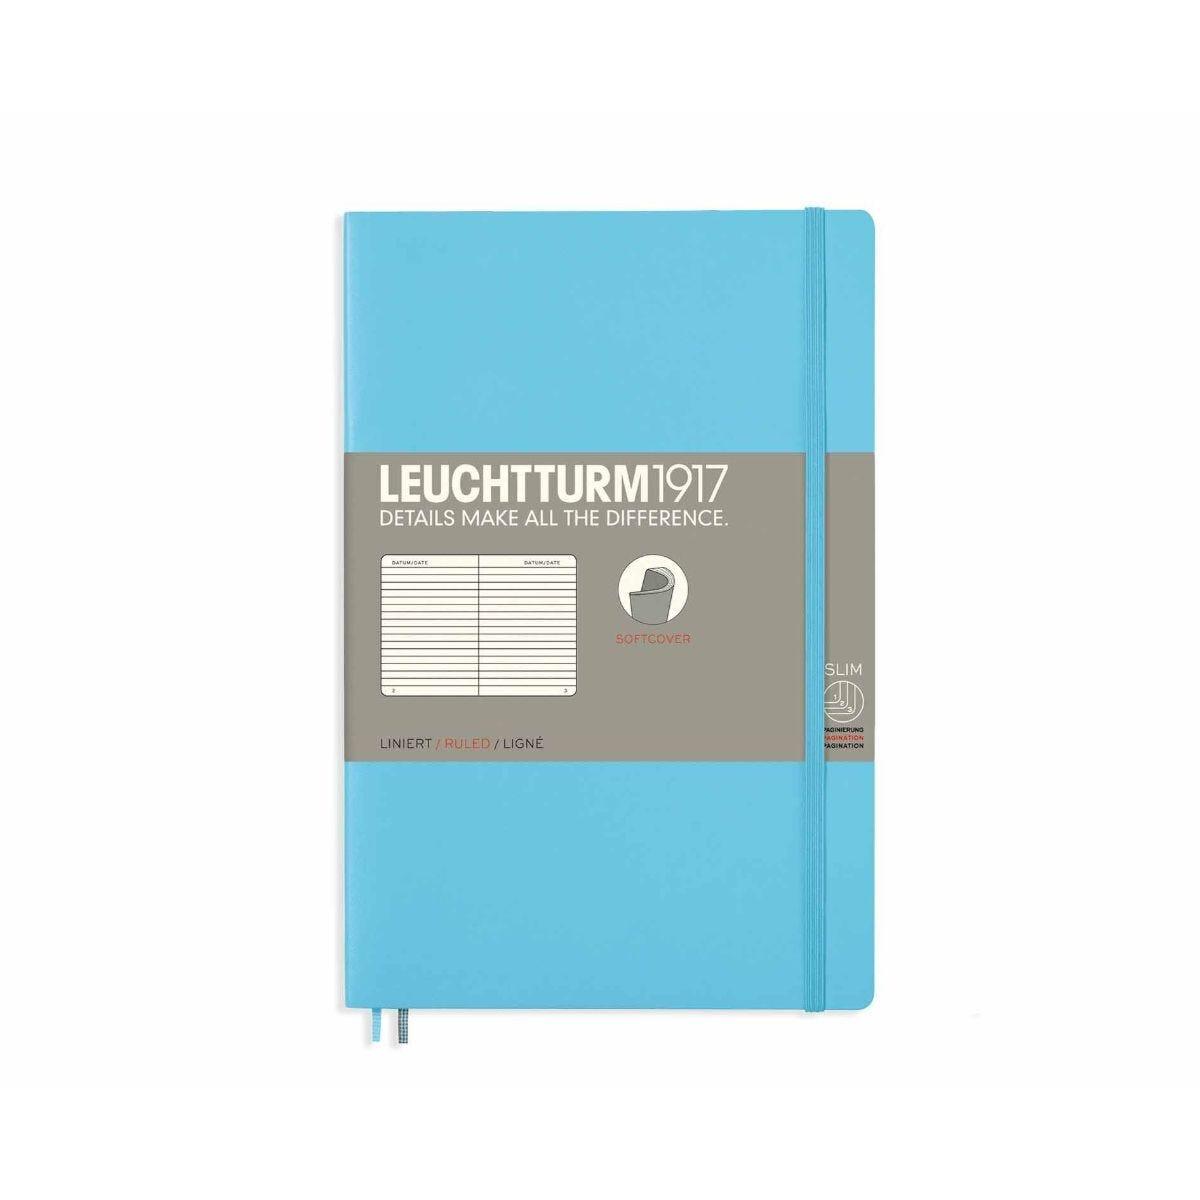 Leuchtturm1917 Soft Cover Notebook Ruled B6 Plus Ice Blue